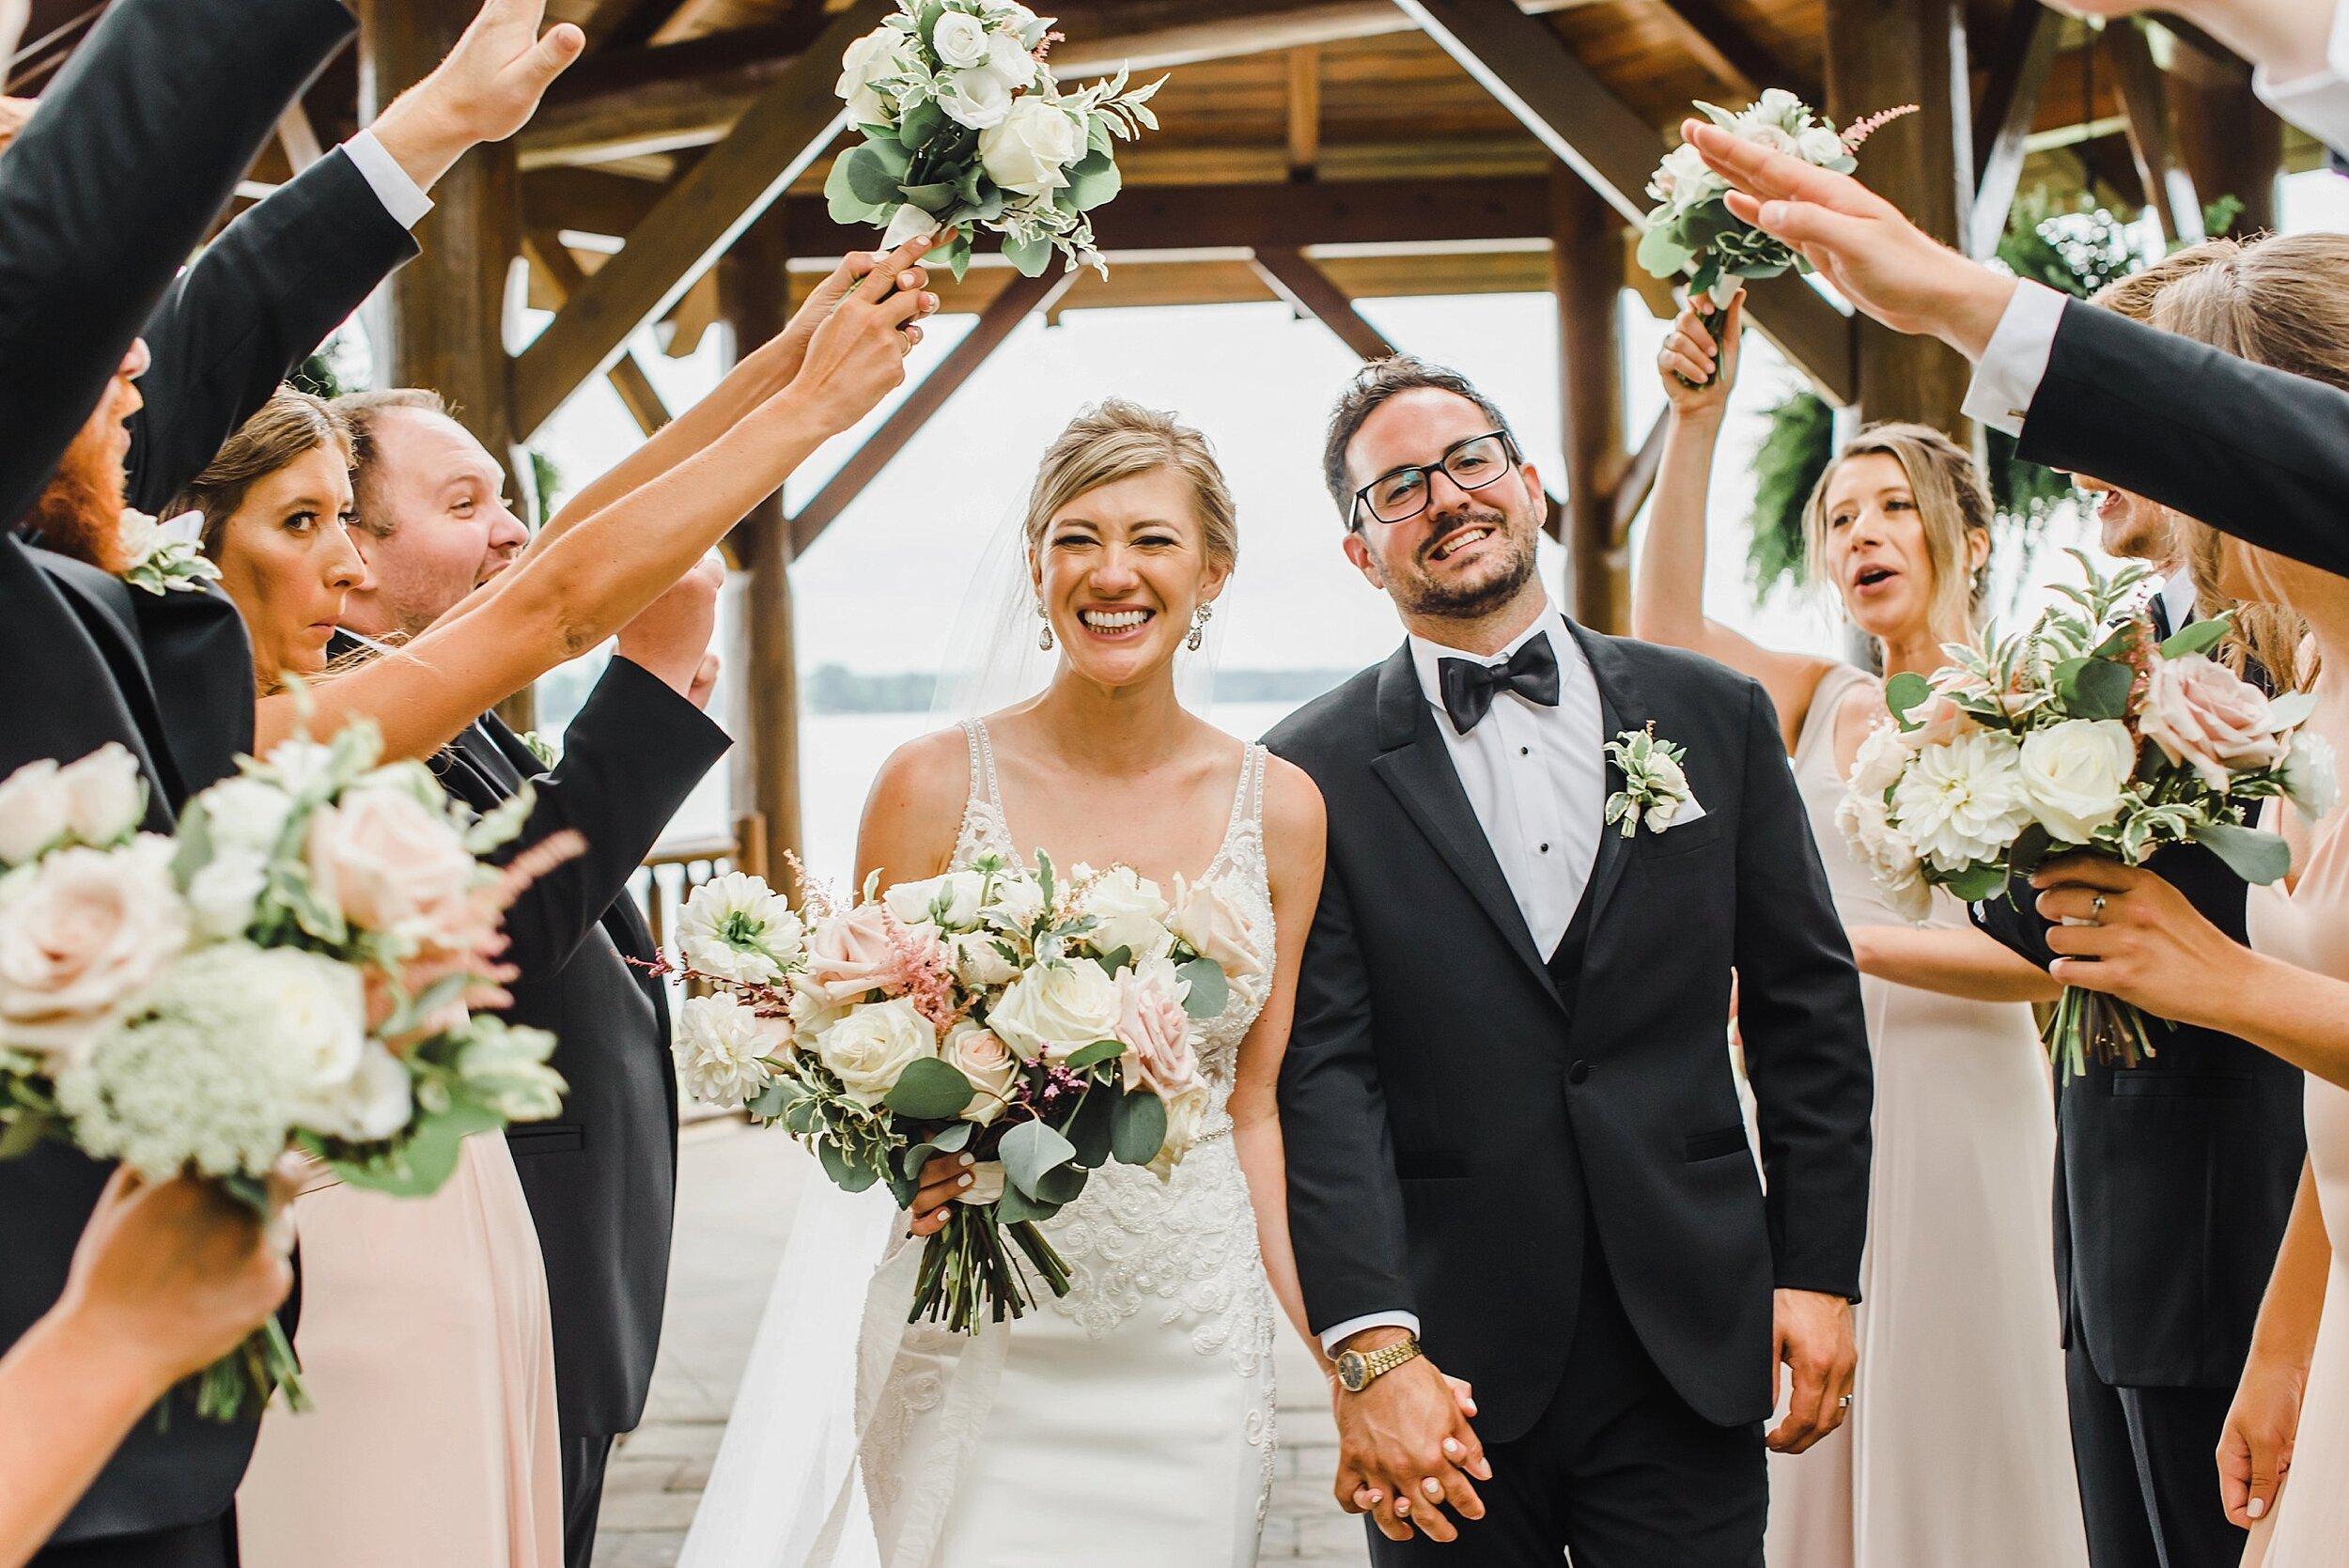 light airy fine art ottawa wedding photographer | Ali and Batoul Photography | Fairmont Le Chateau Montebello45.jpg